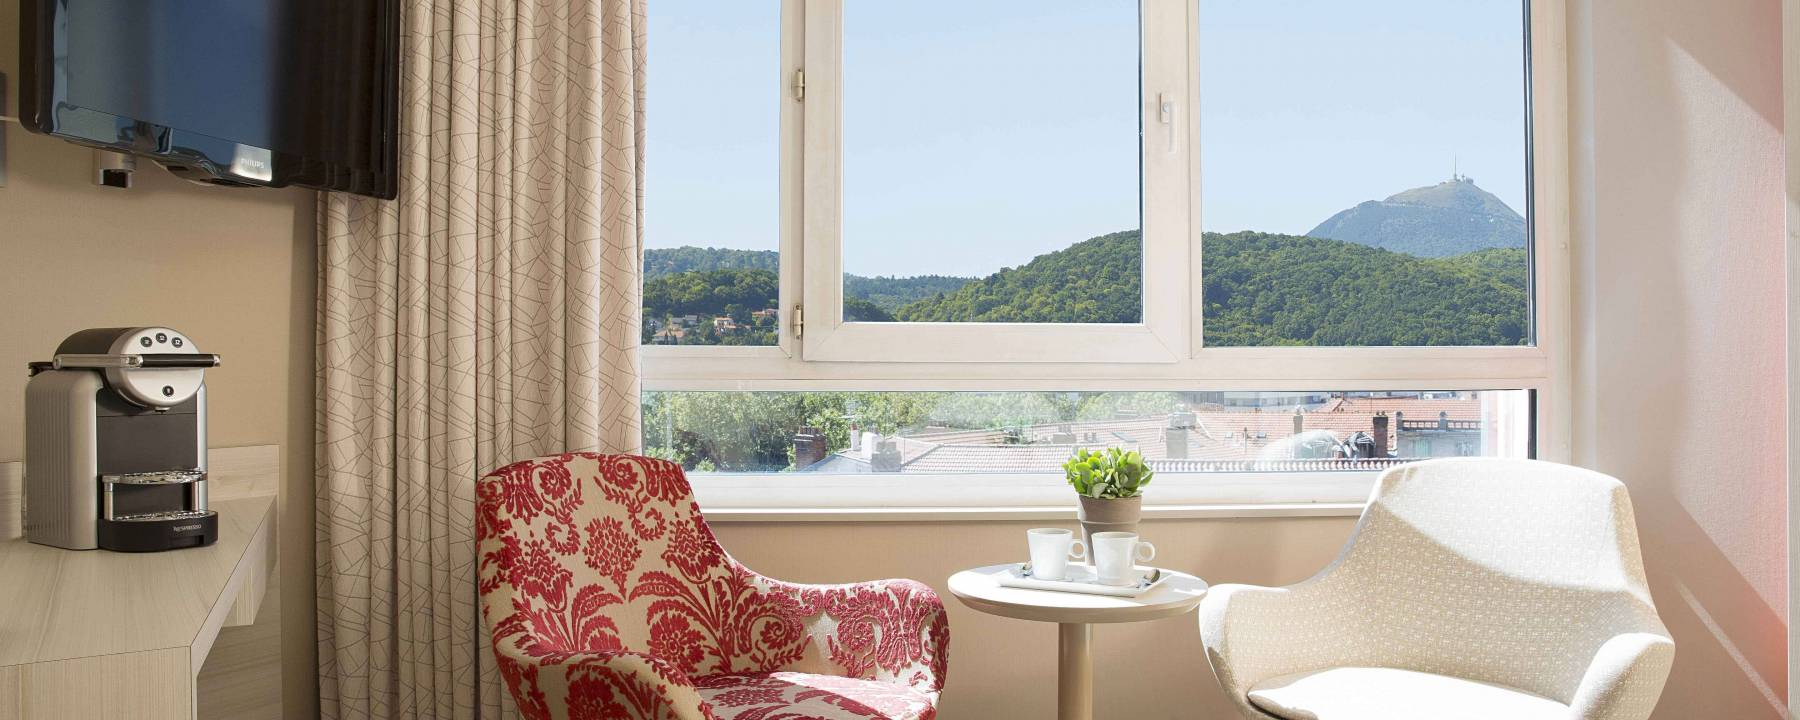 hotel oceania clermont ferrand clermont ferrand